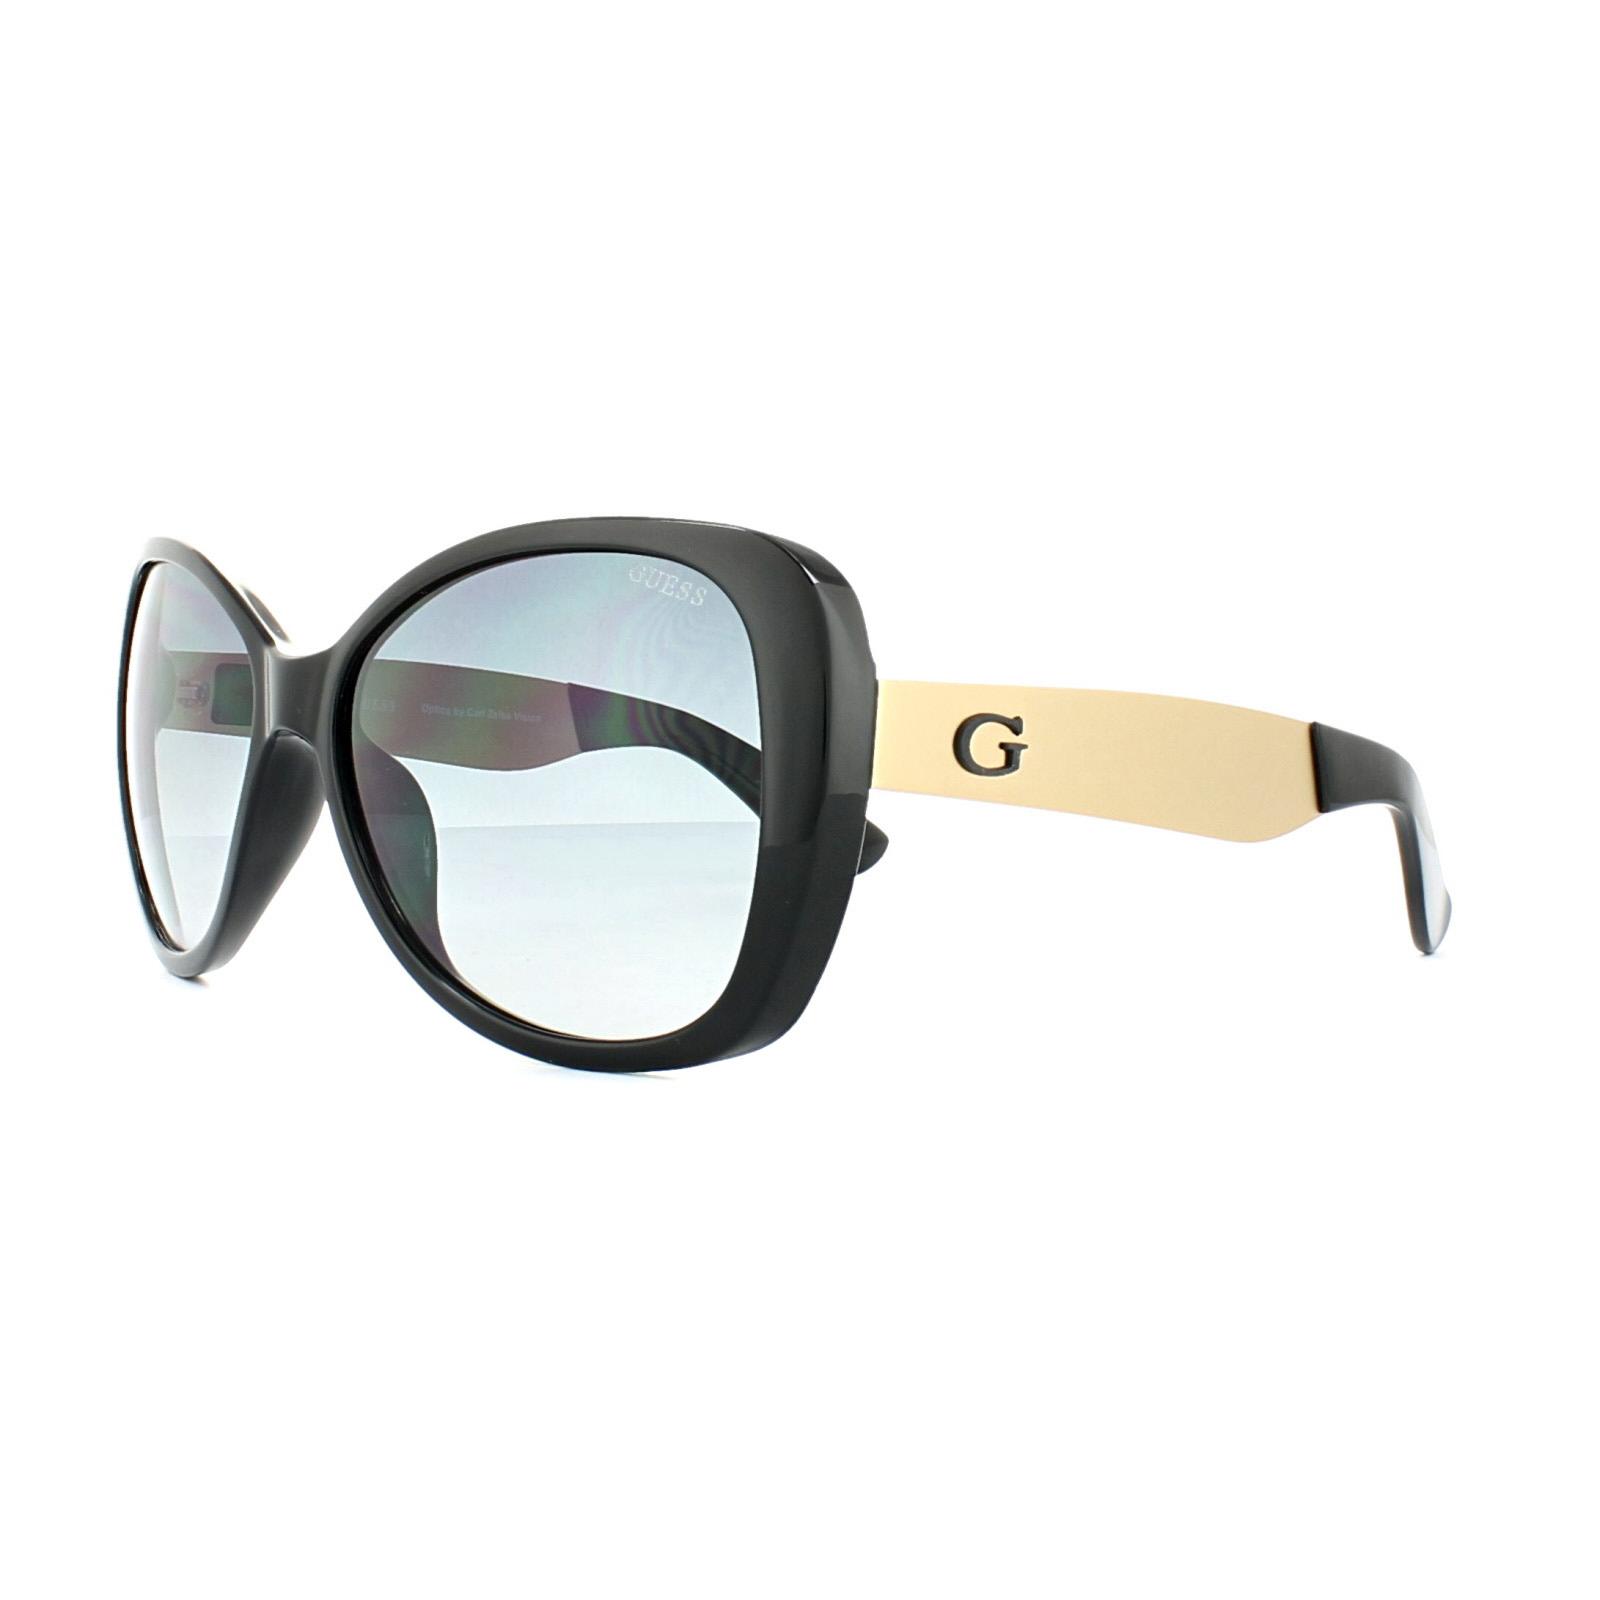 51b4418183f Cheap Guess GU7392 Sunglasses - Discounted Sunglasses